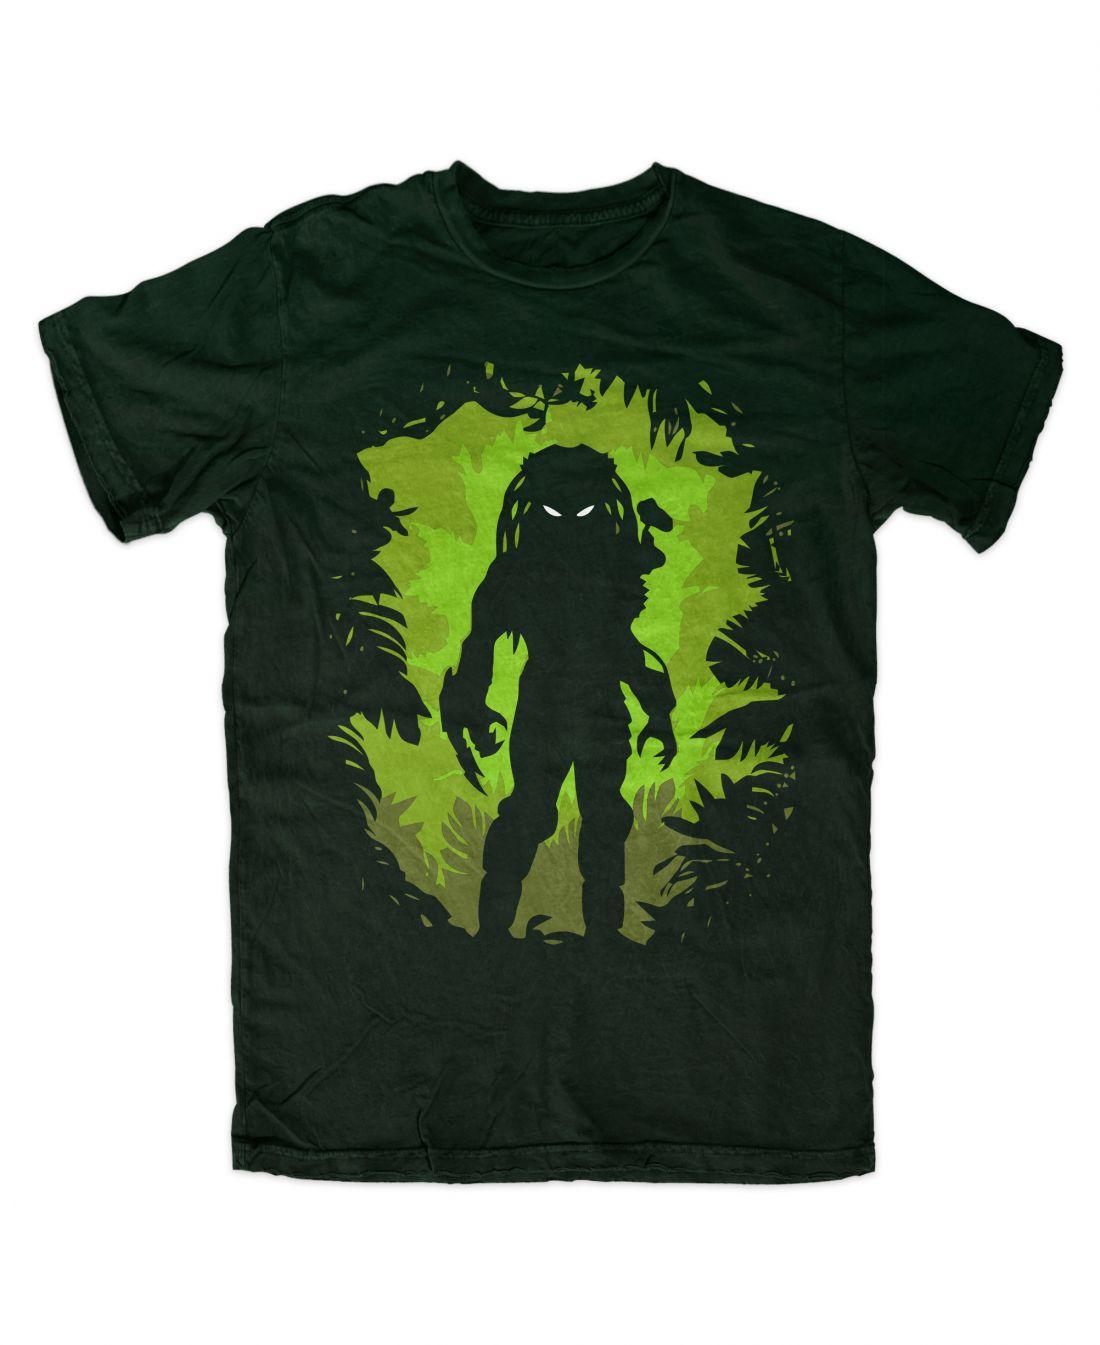 Predator 001 (forest green póló)